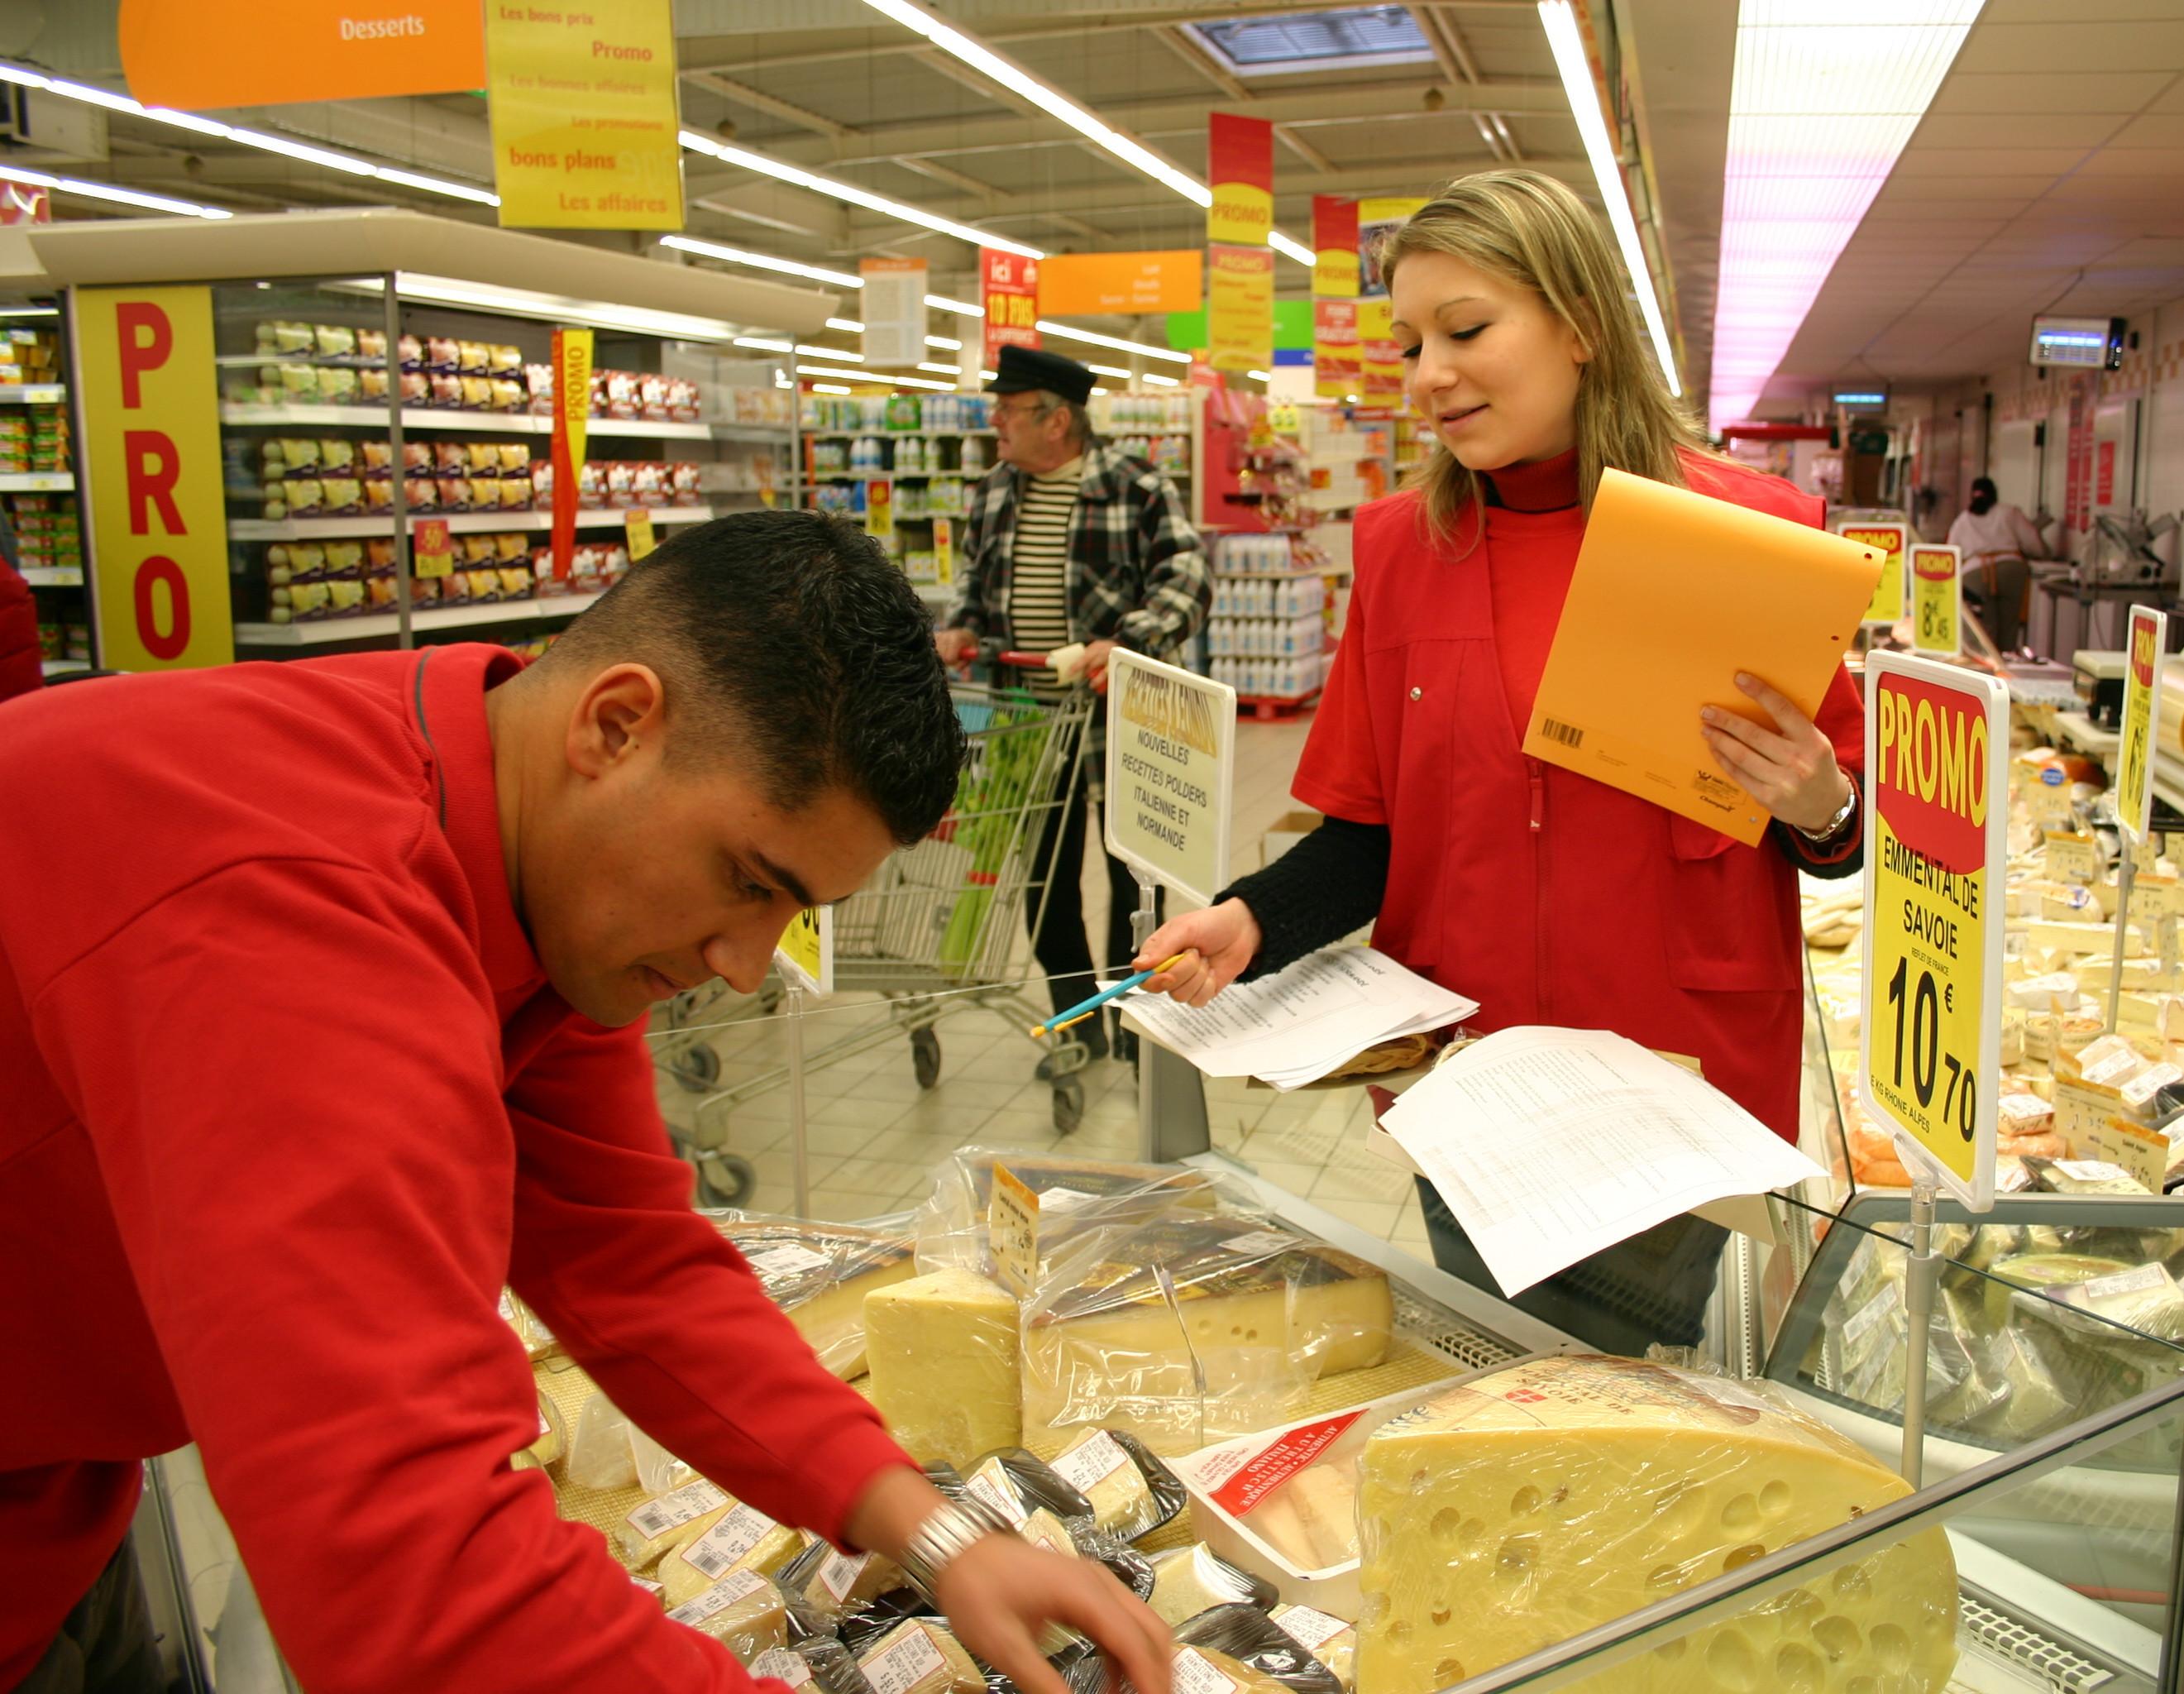 promotion merchandising produits rayon supermarché